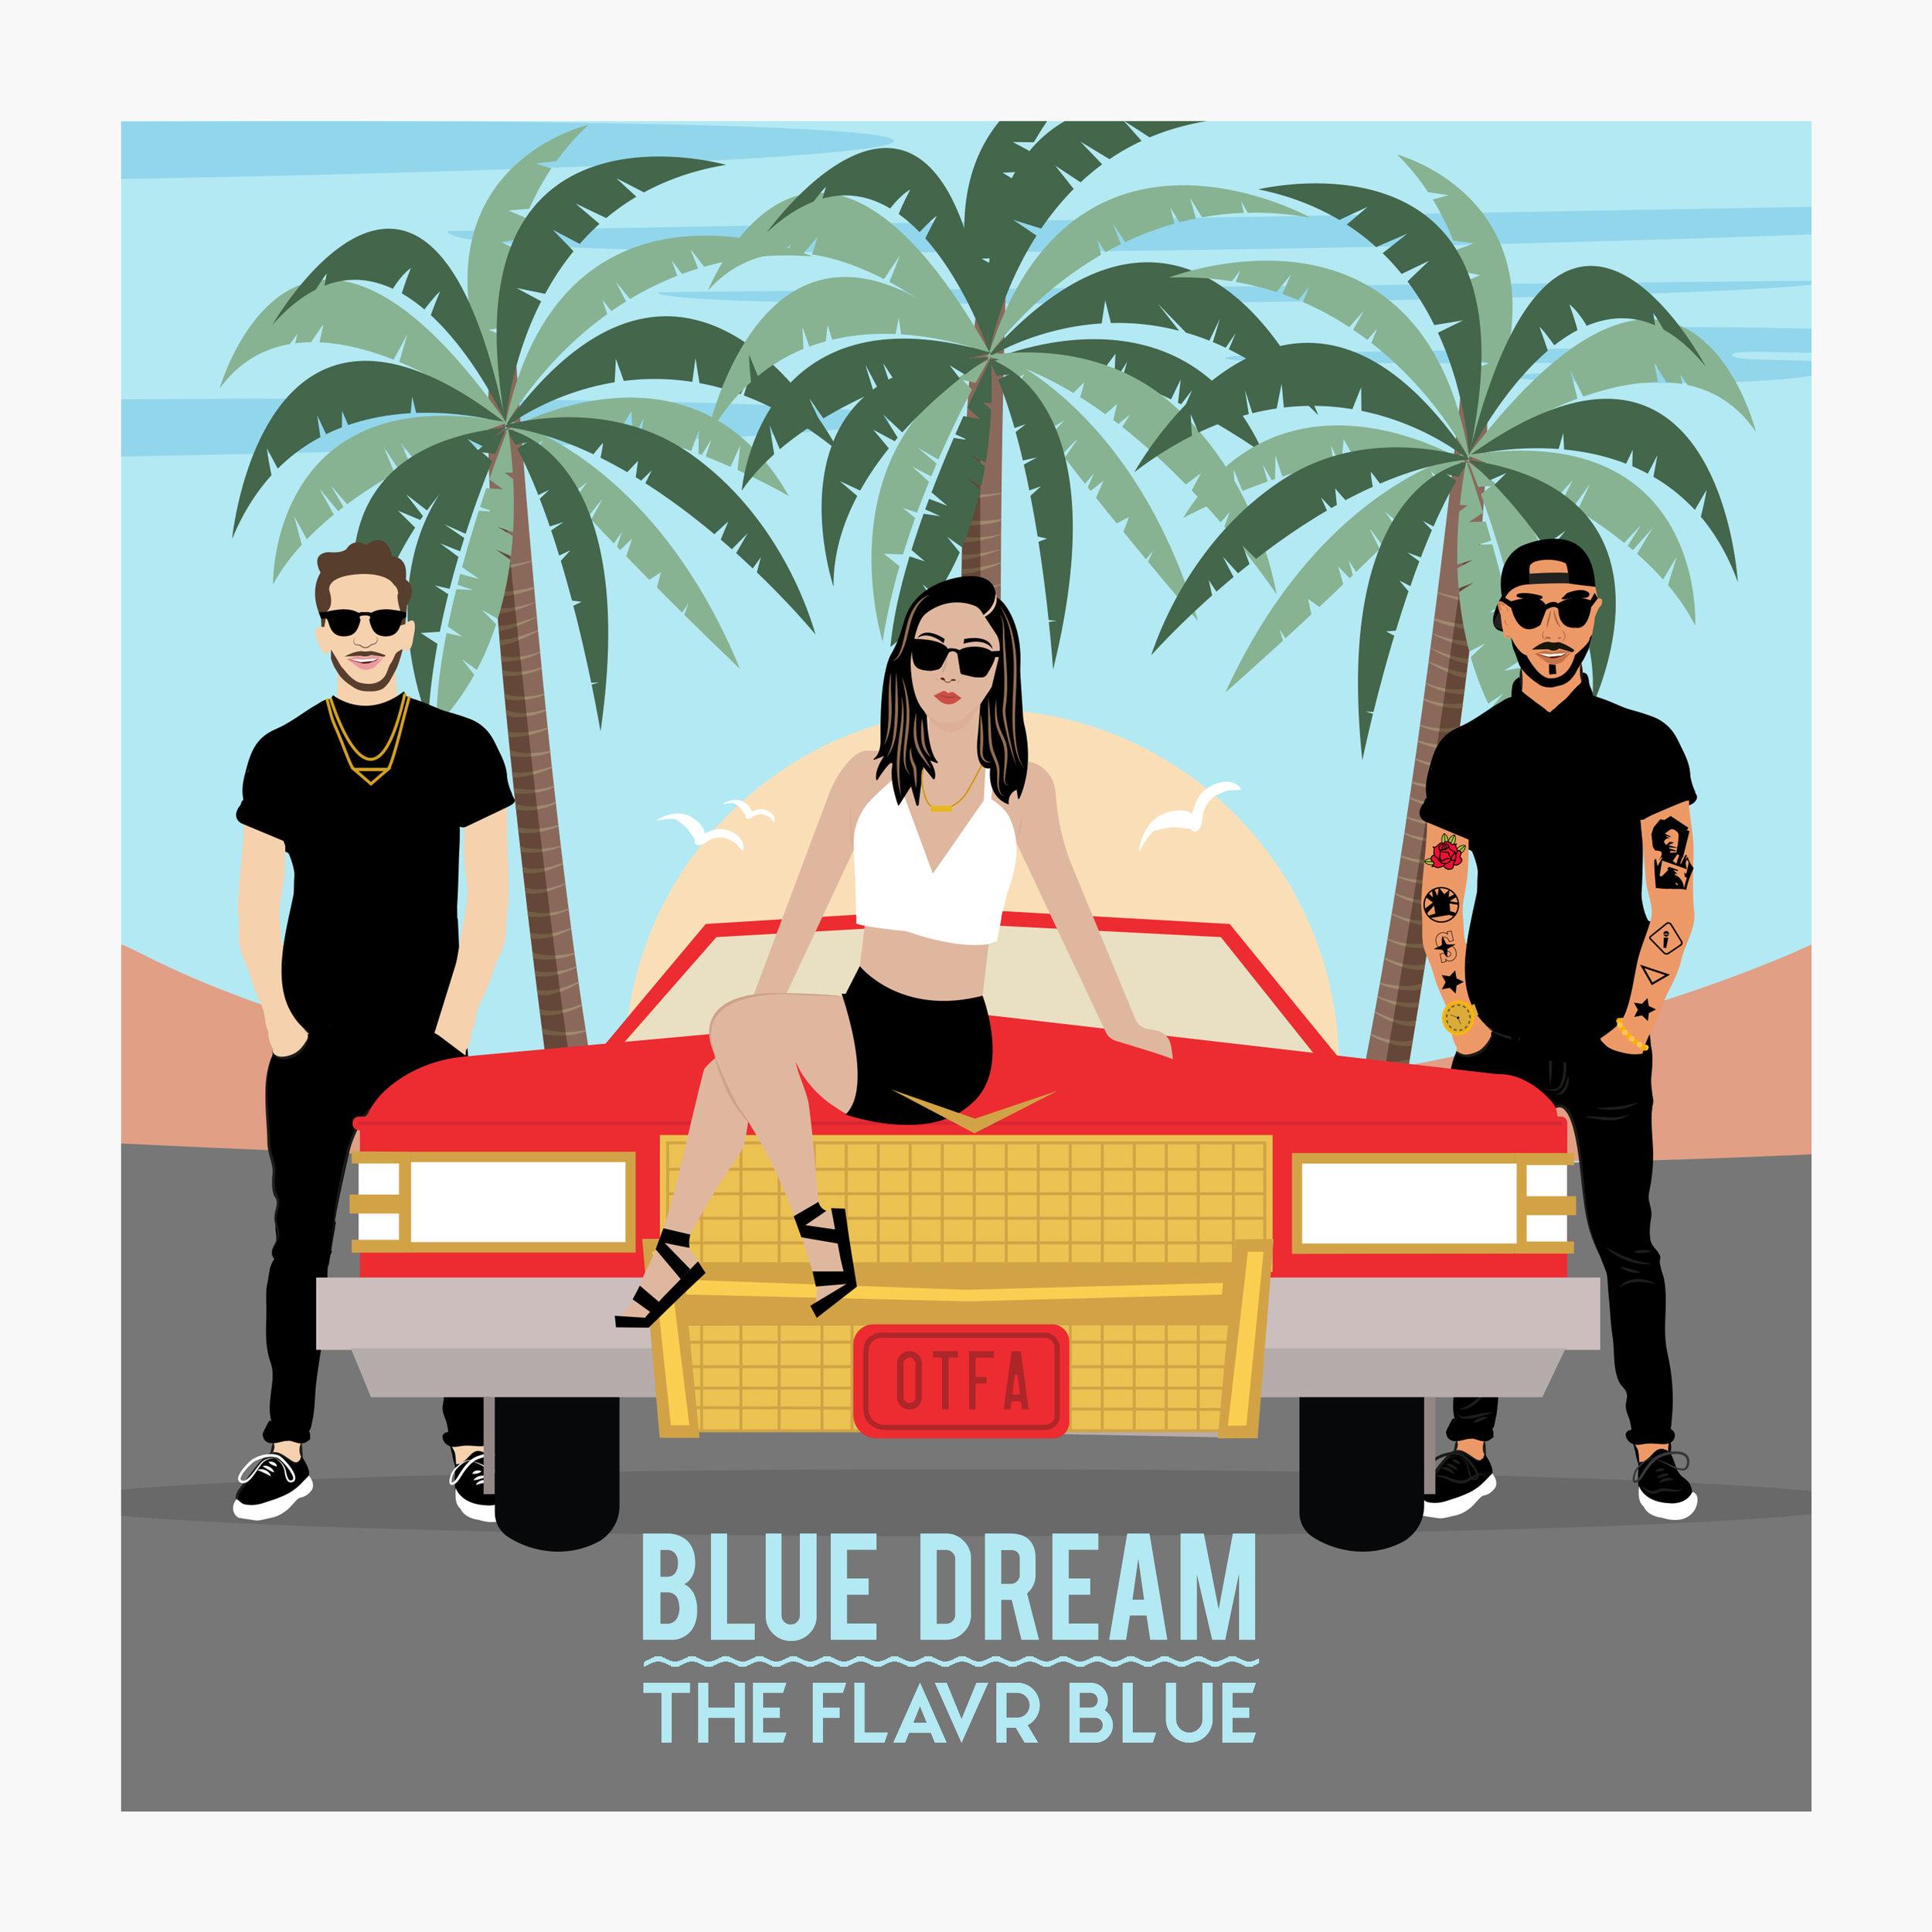 bluedreamcover.jpg